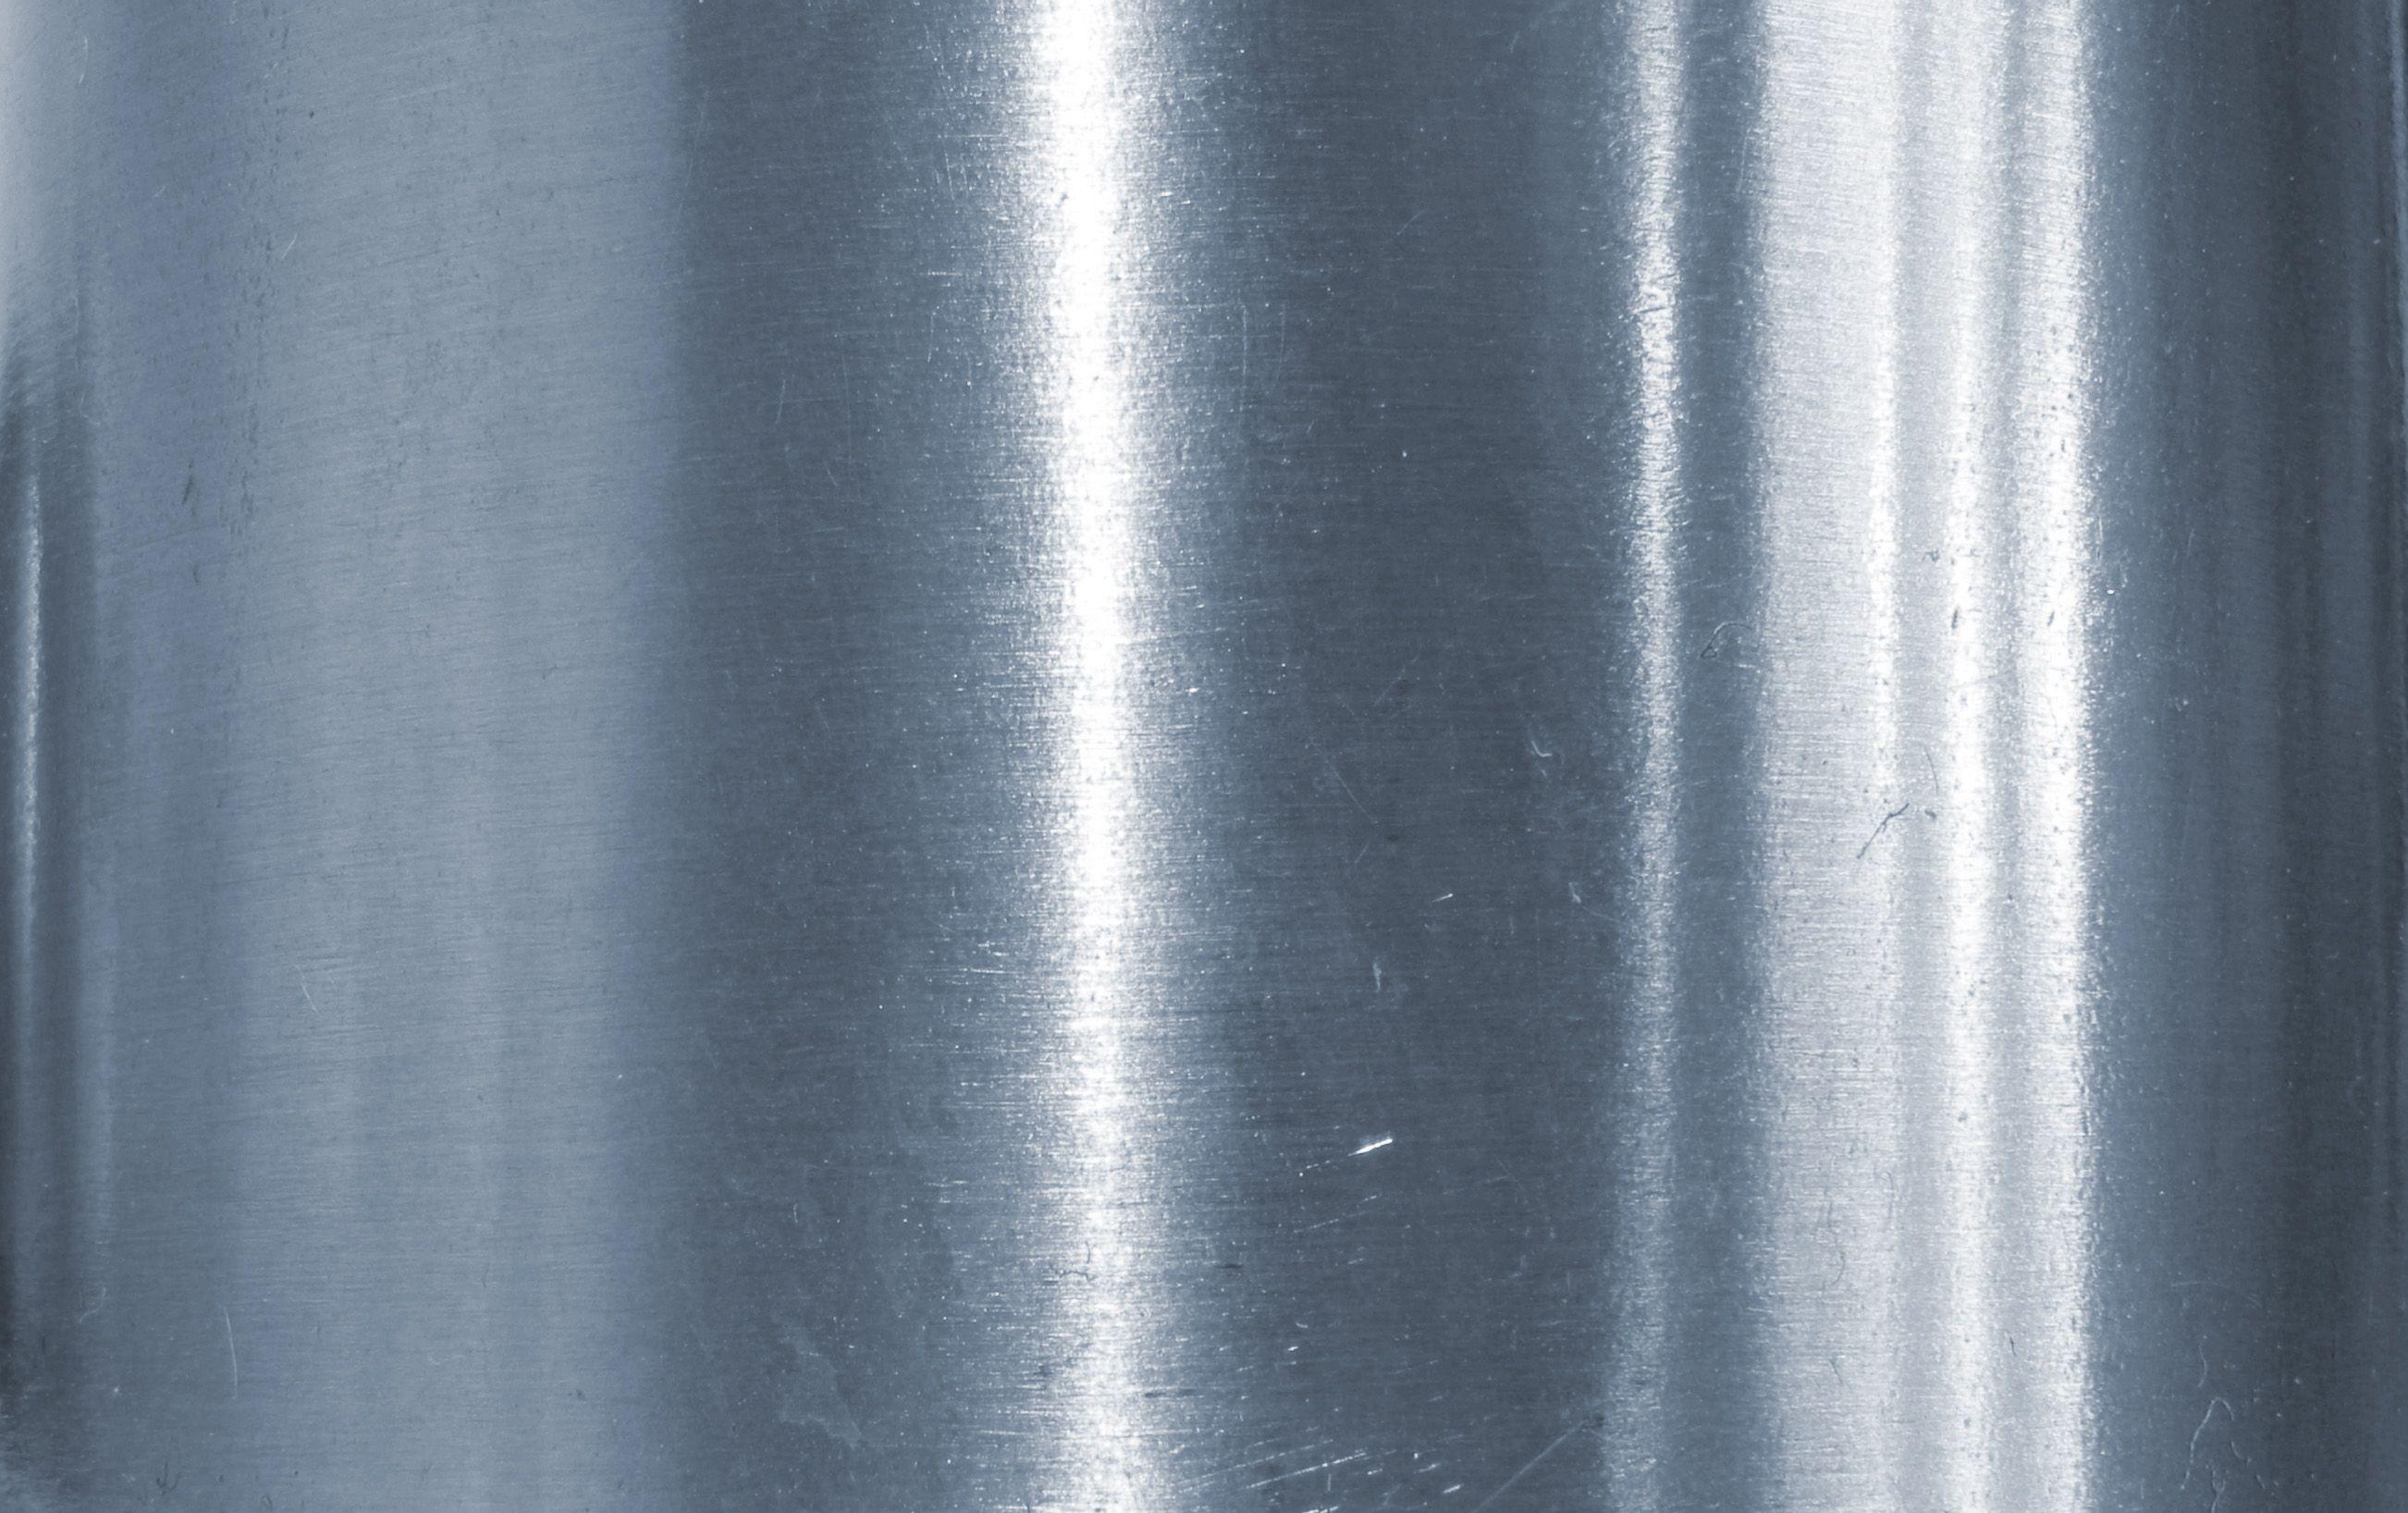 Chrome Texture Buscar Con Google Metal Texture Brushed Metal Texture Brushed Metal